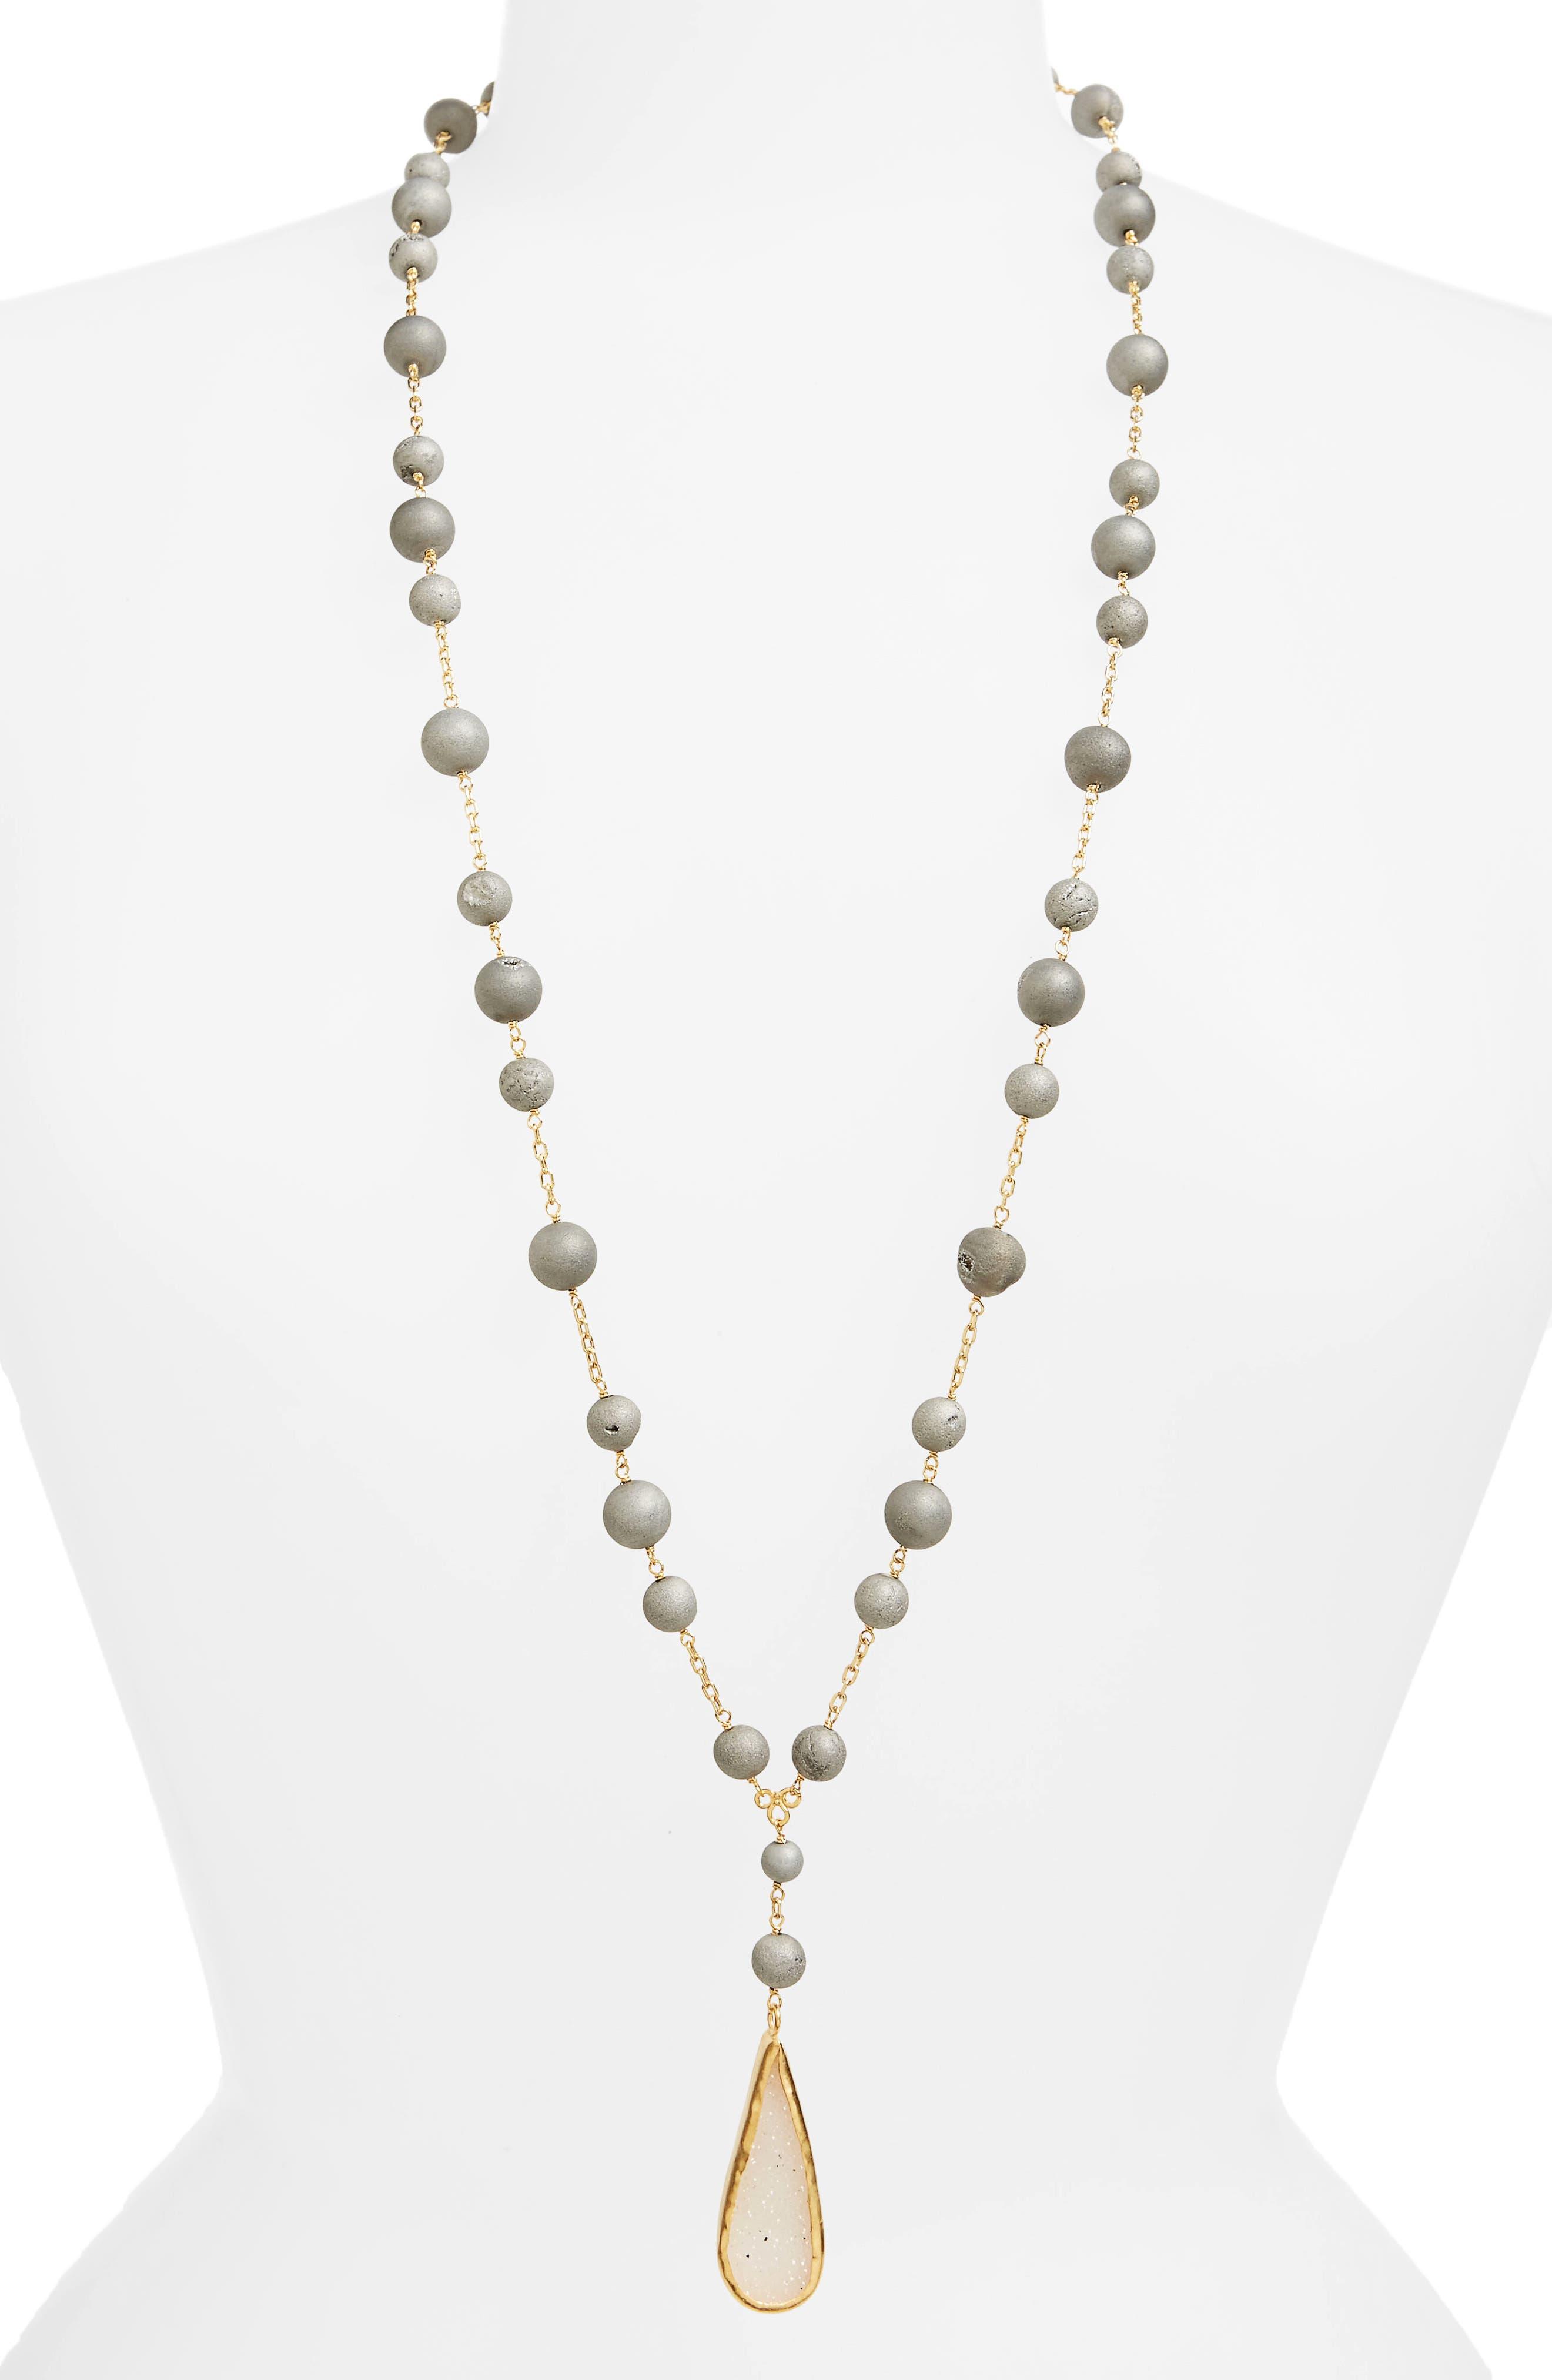 Drusy Agate Pendant Necklace,                             Main thumbnail 1, color,                             Silver Agate